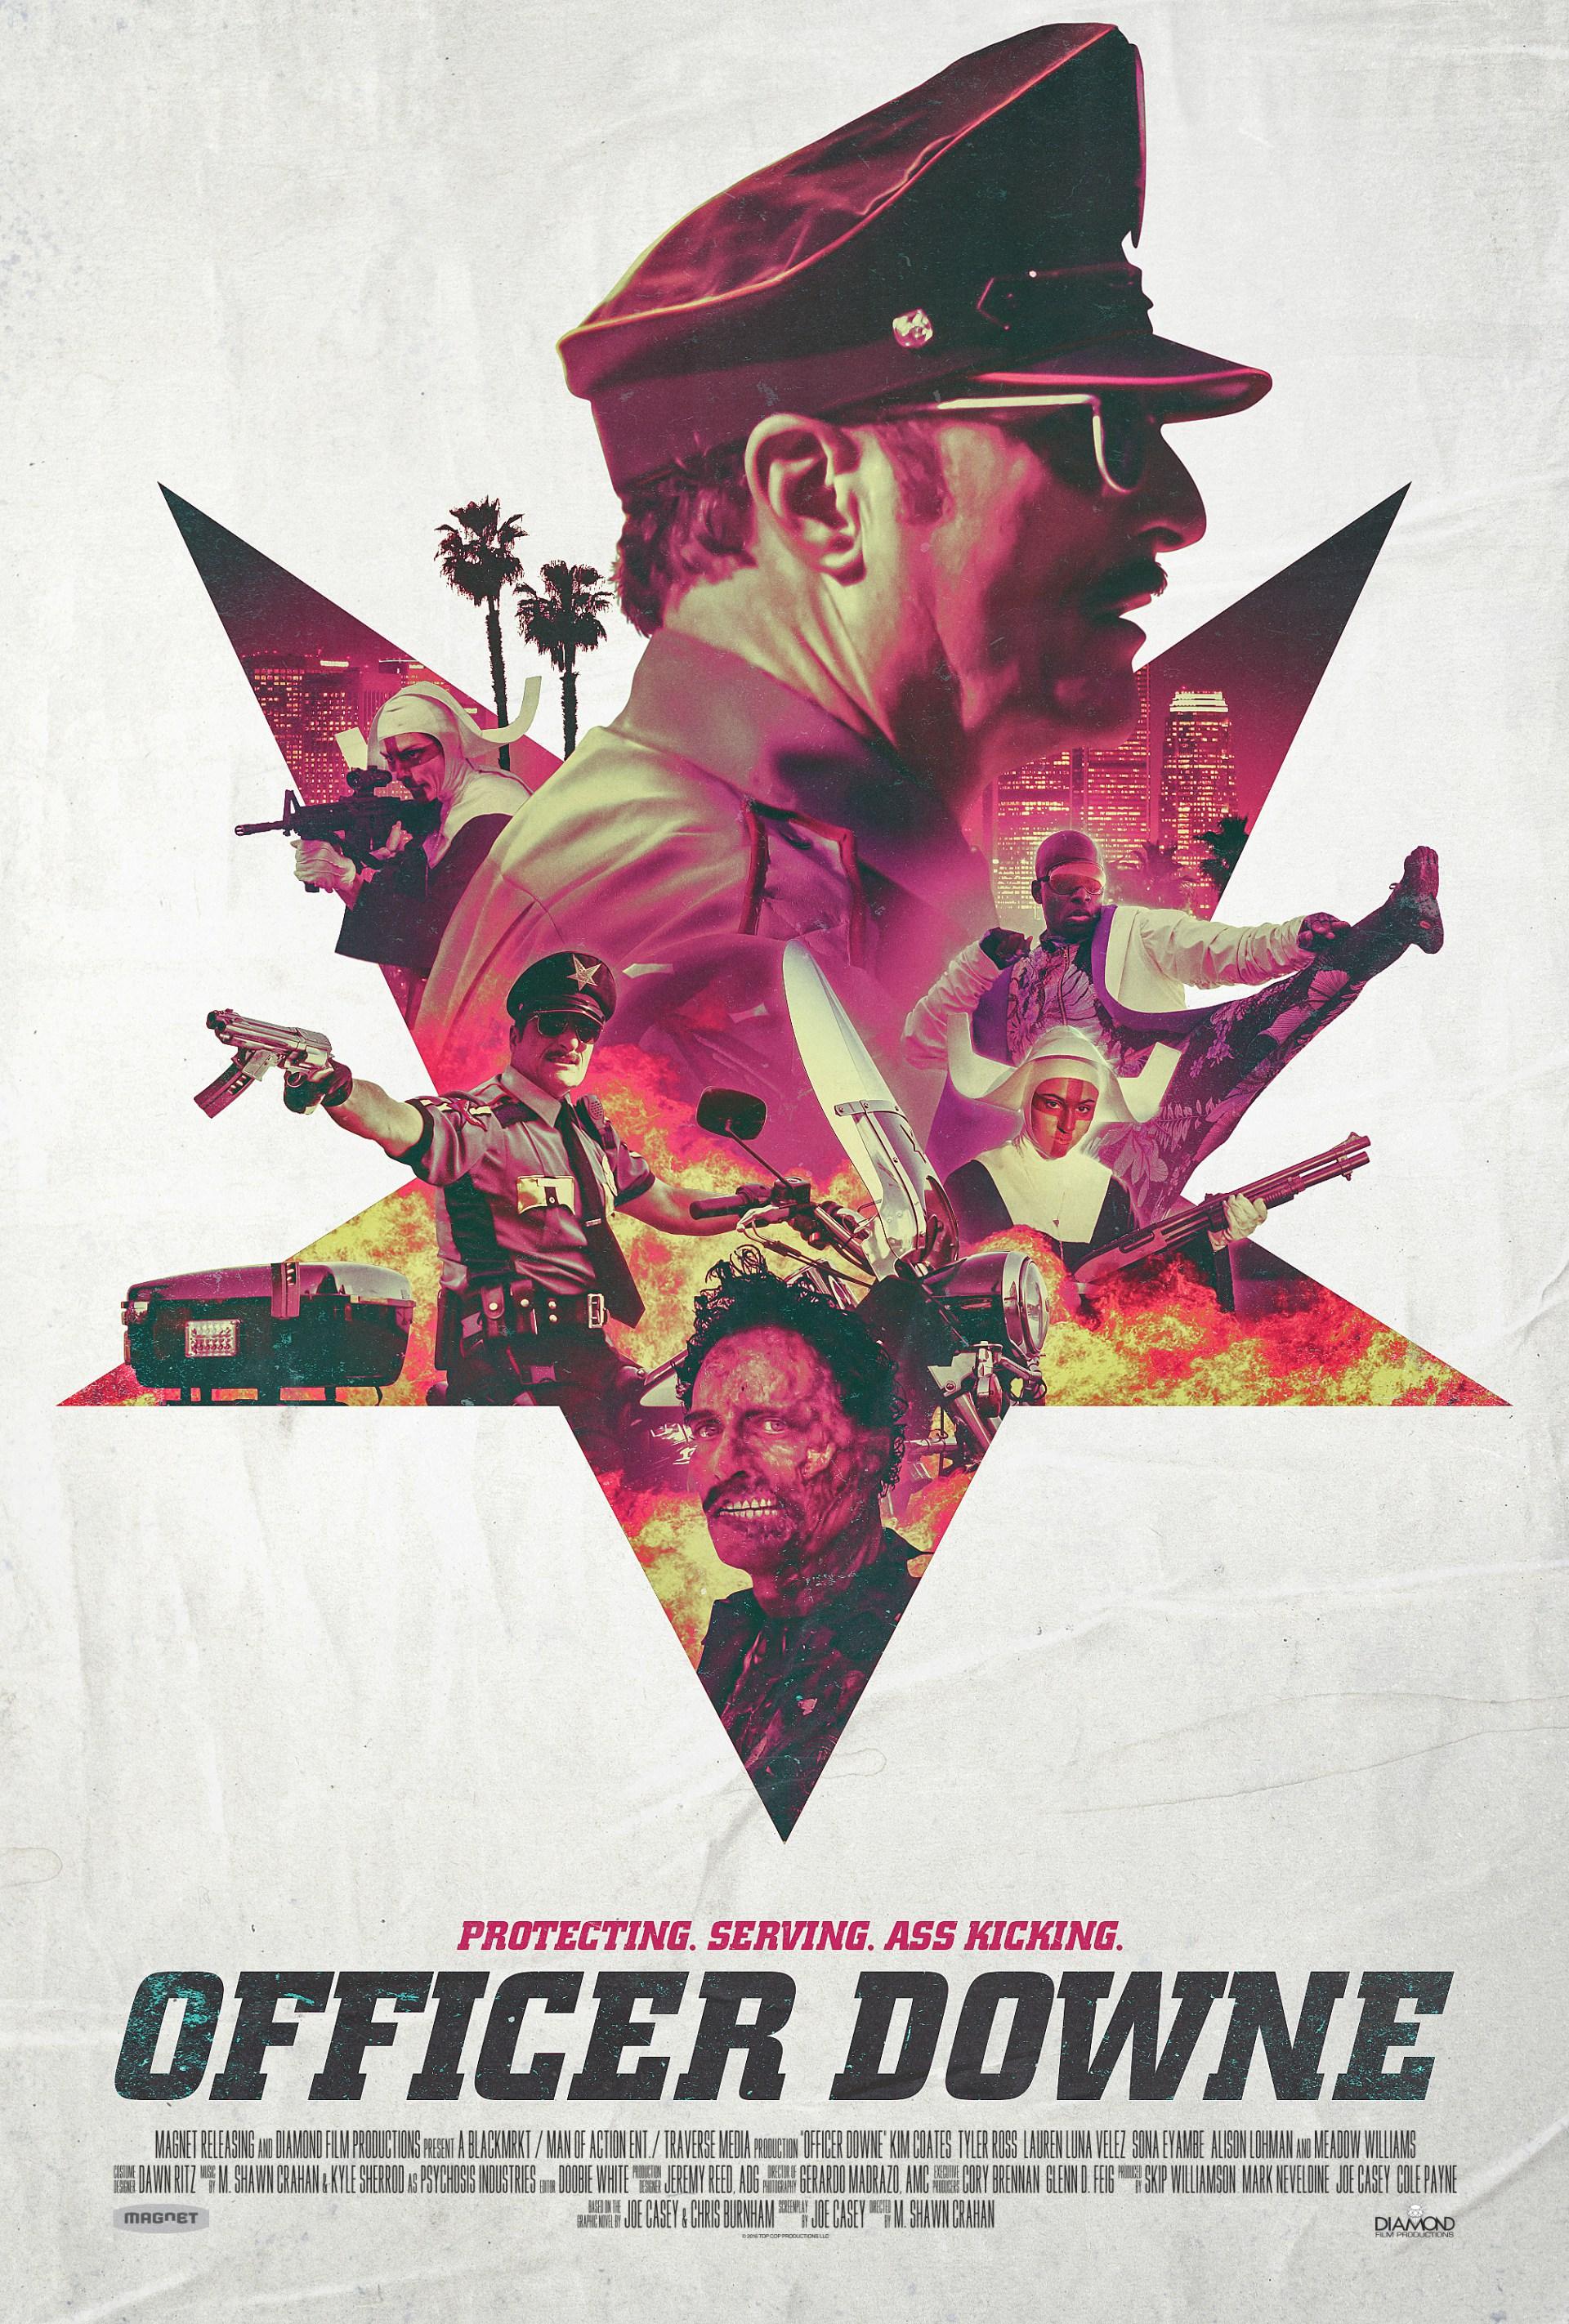 officerdowne_poster